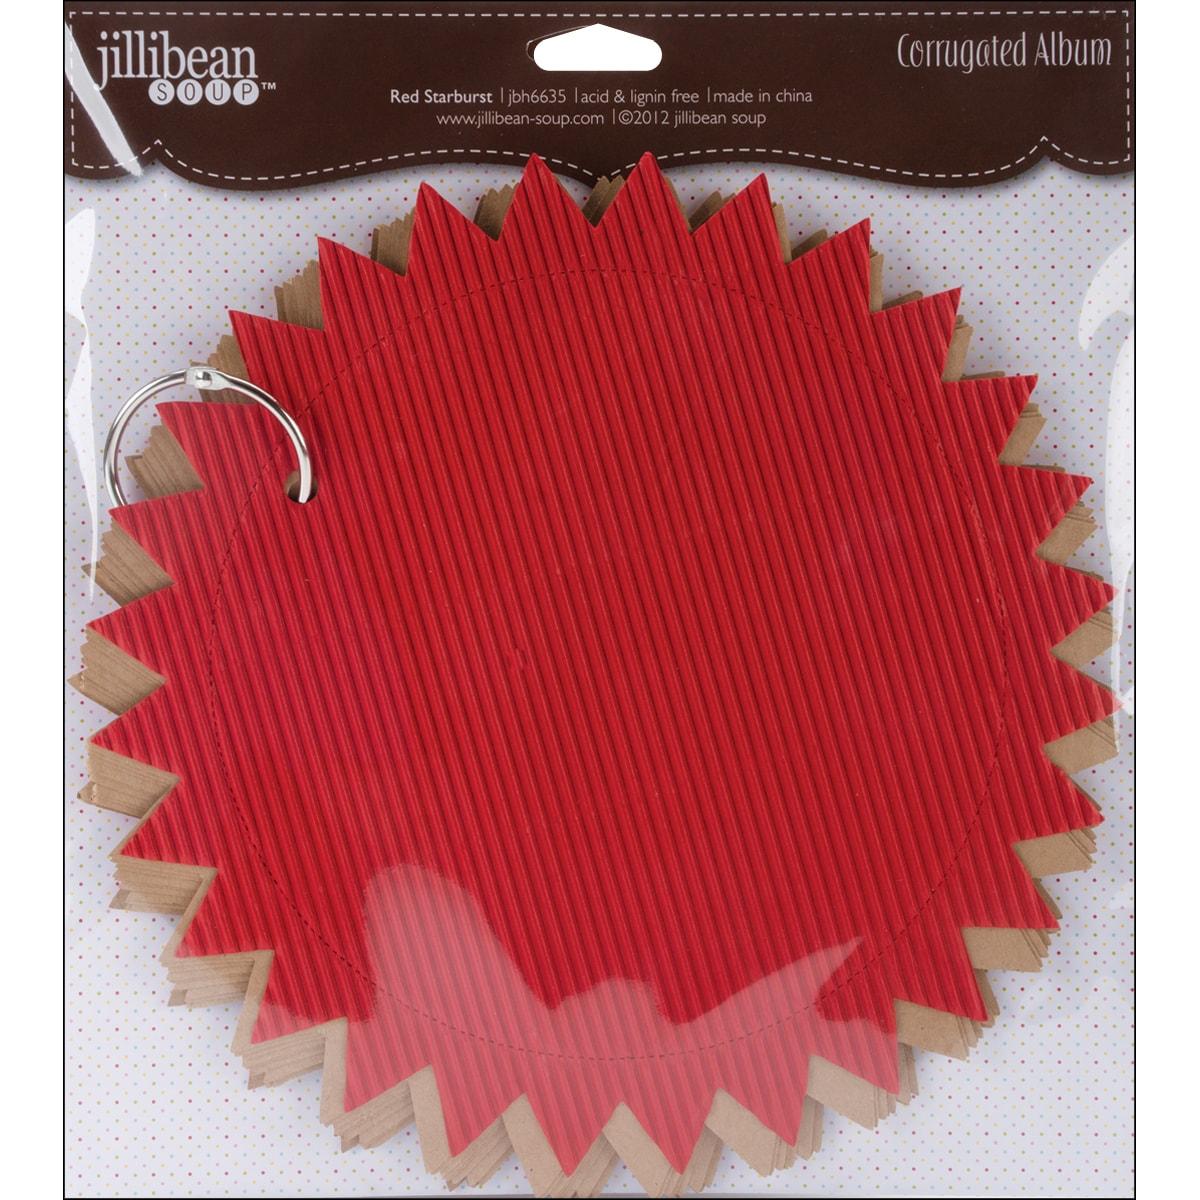 "Die-Cut 'Red Starburst' Corrugated Album 8.5"""